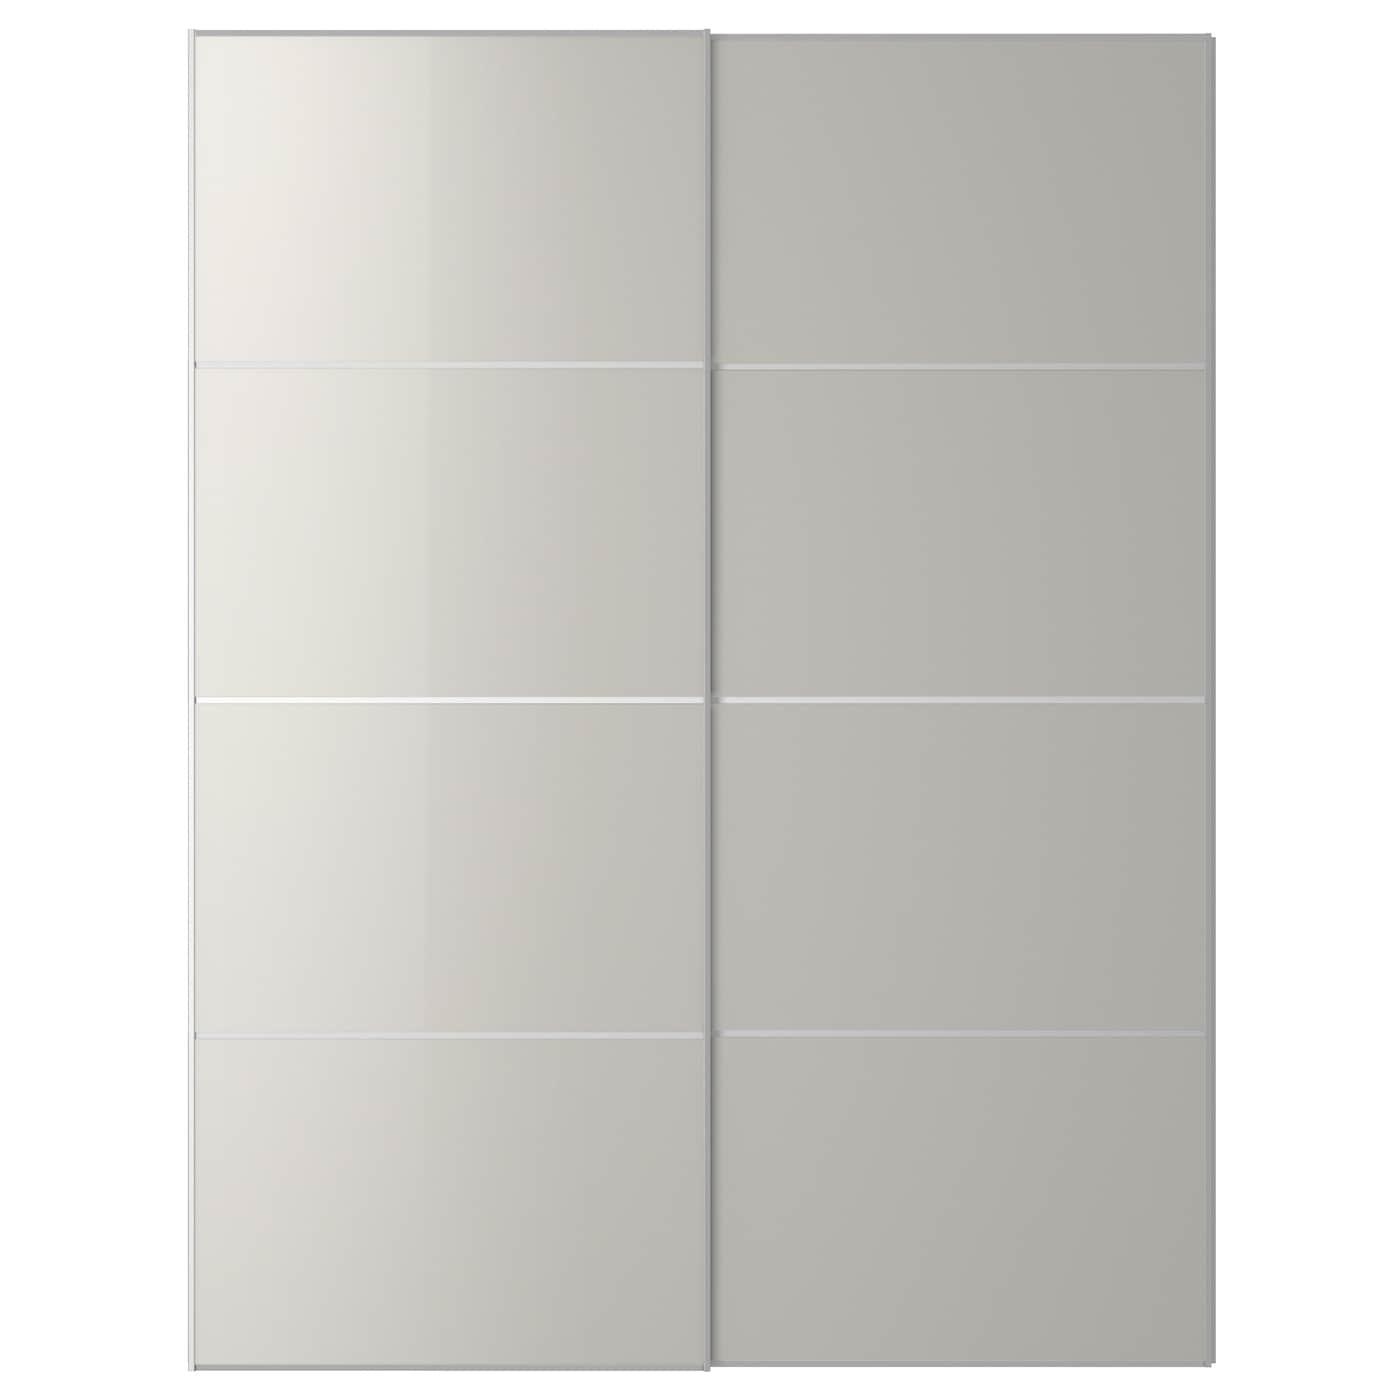 Materials ikea pax tonnes sliding doors white - Ikea Hokksund Pair Of Sliding Doors